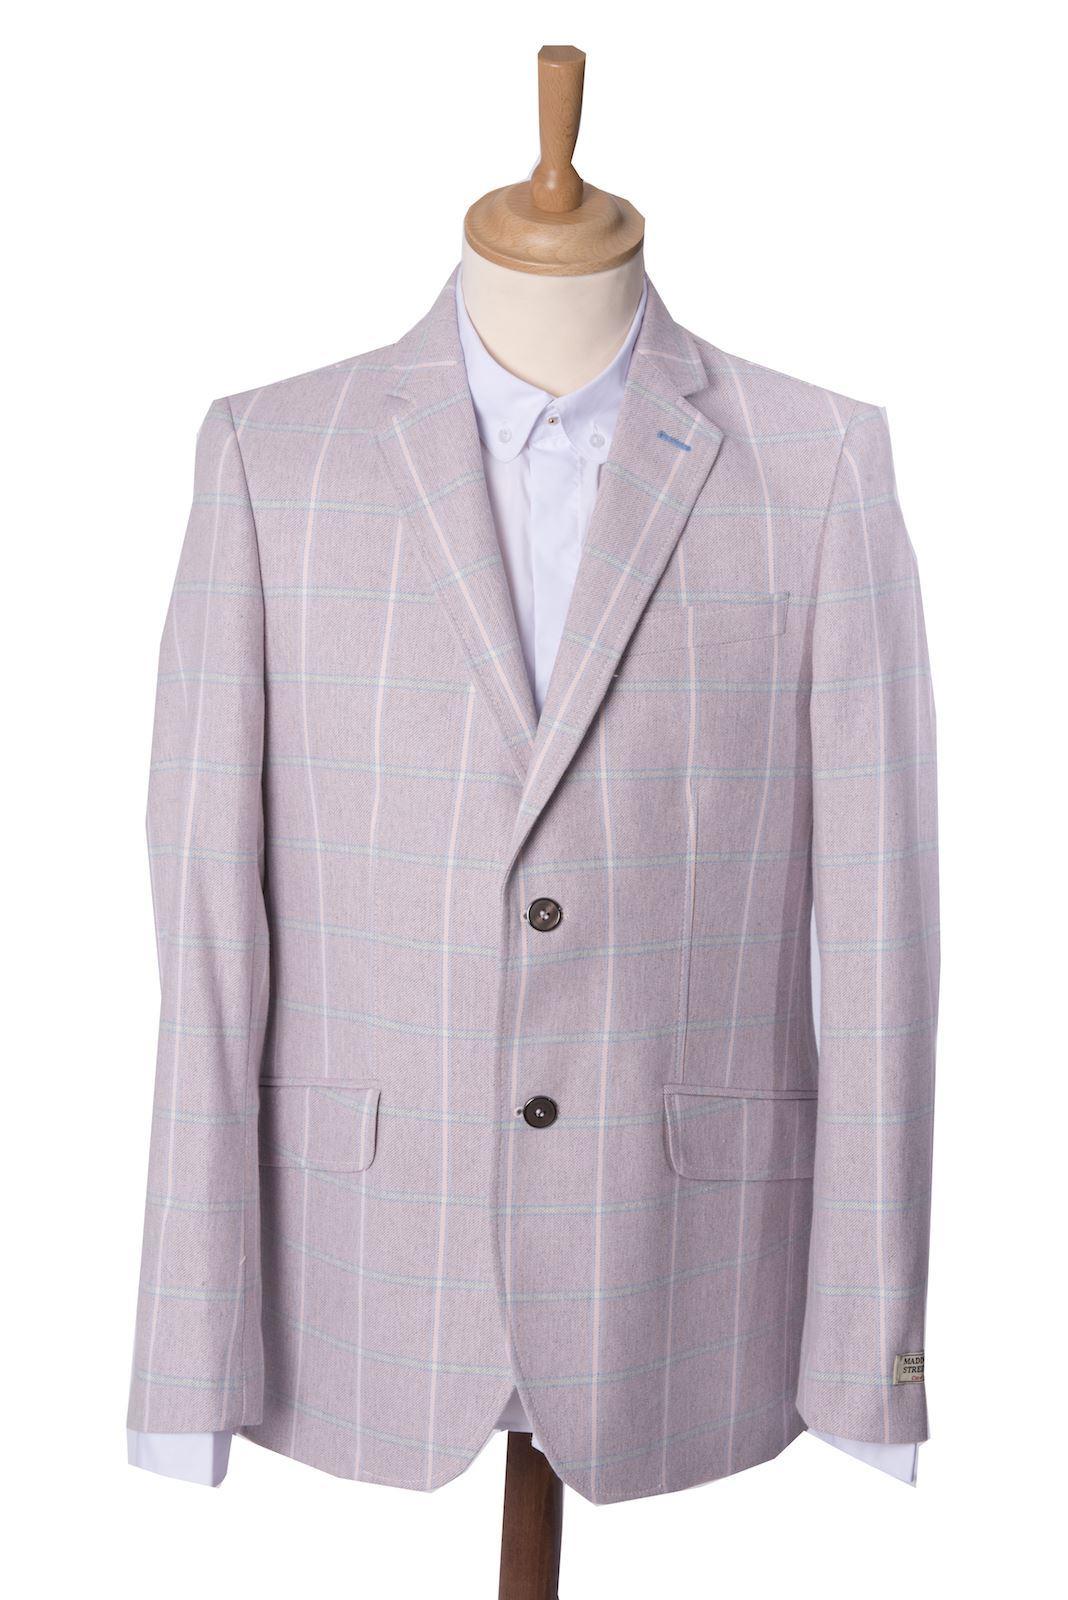 Mens Pink Tailored Jacket Heritage Checked Blazer Coat Maddox St ...